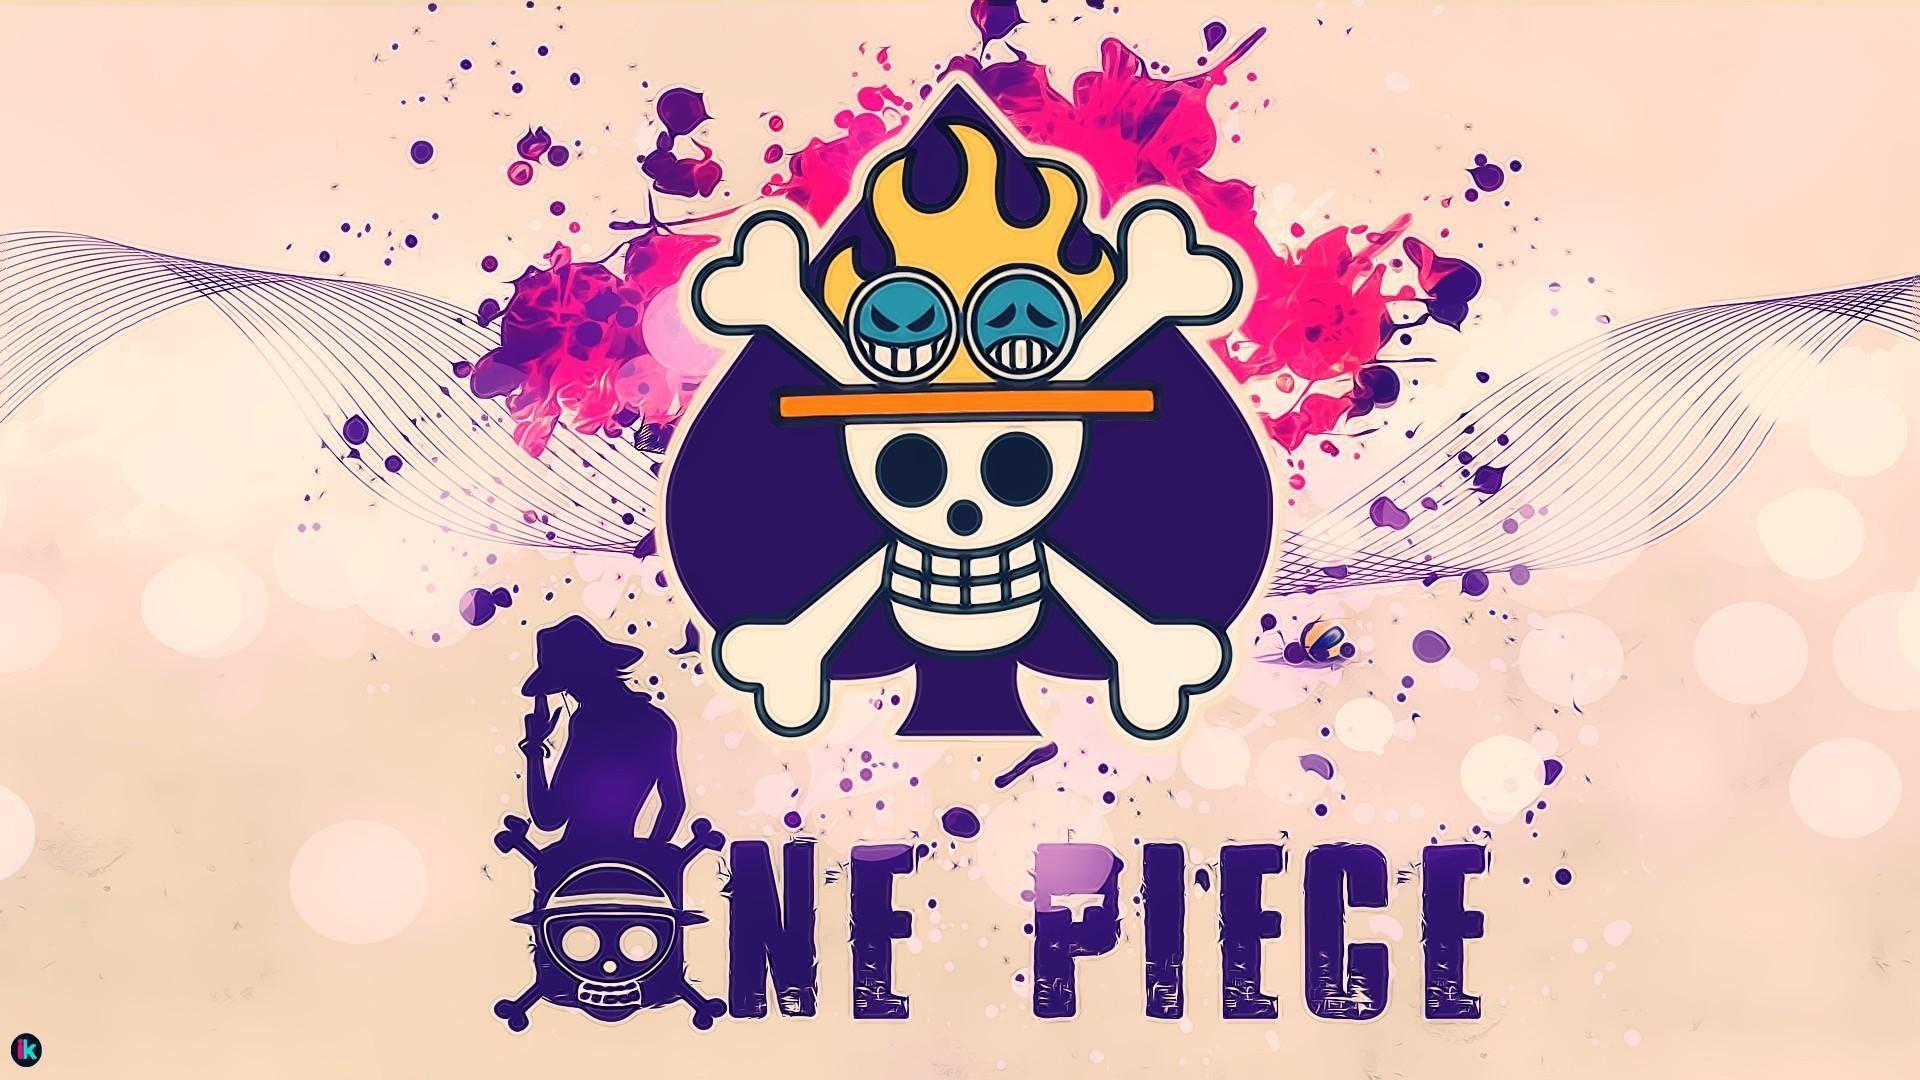 1920x1080 Portgas D Ace Wallpaper One Piece Logo Hd Wallpaper Anime